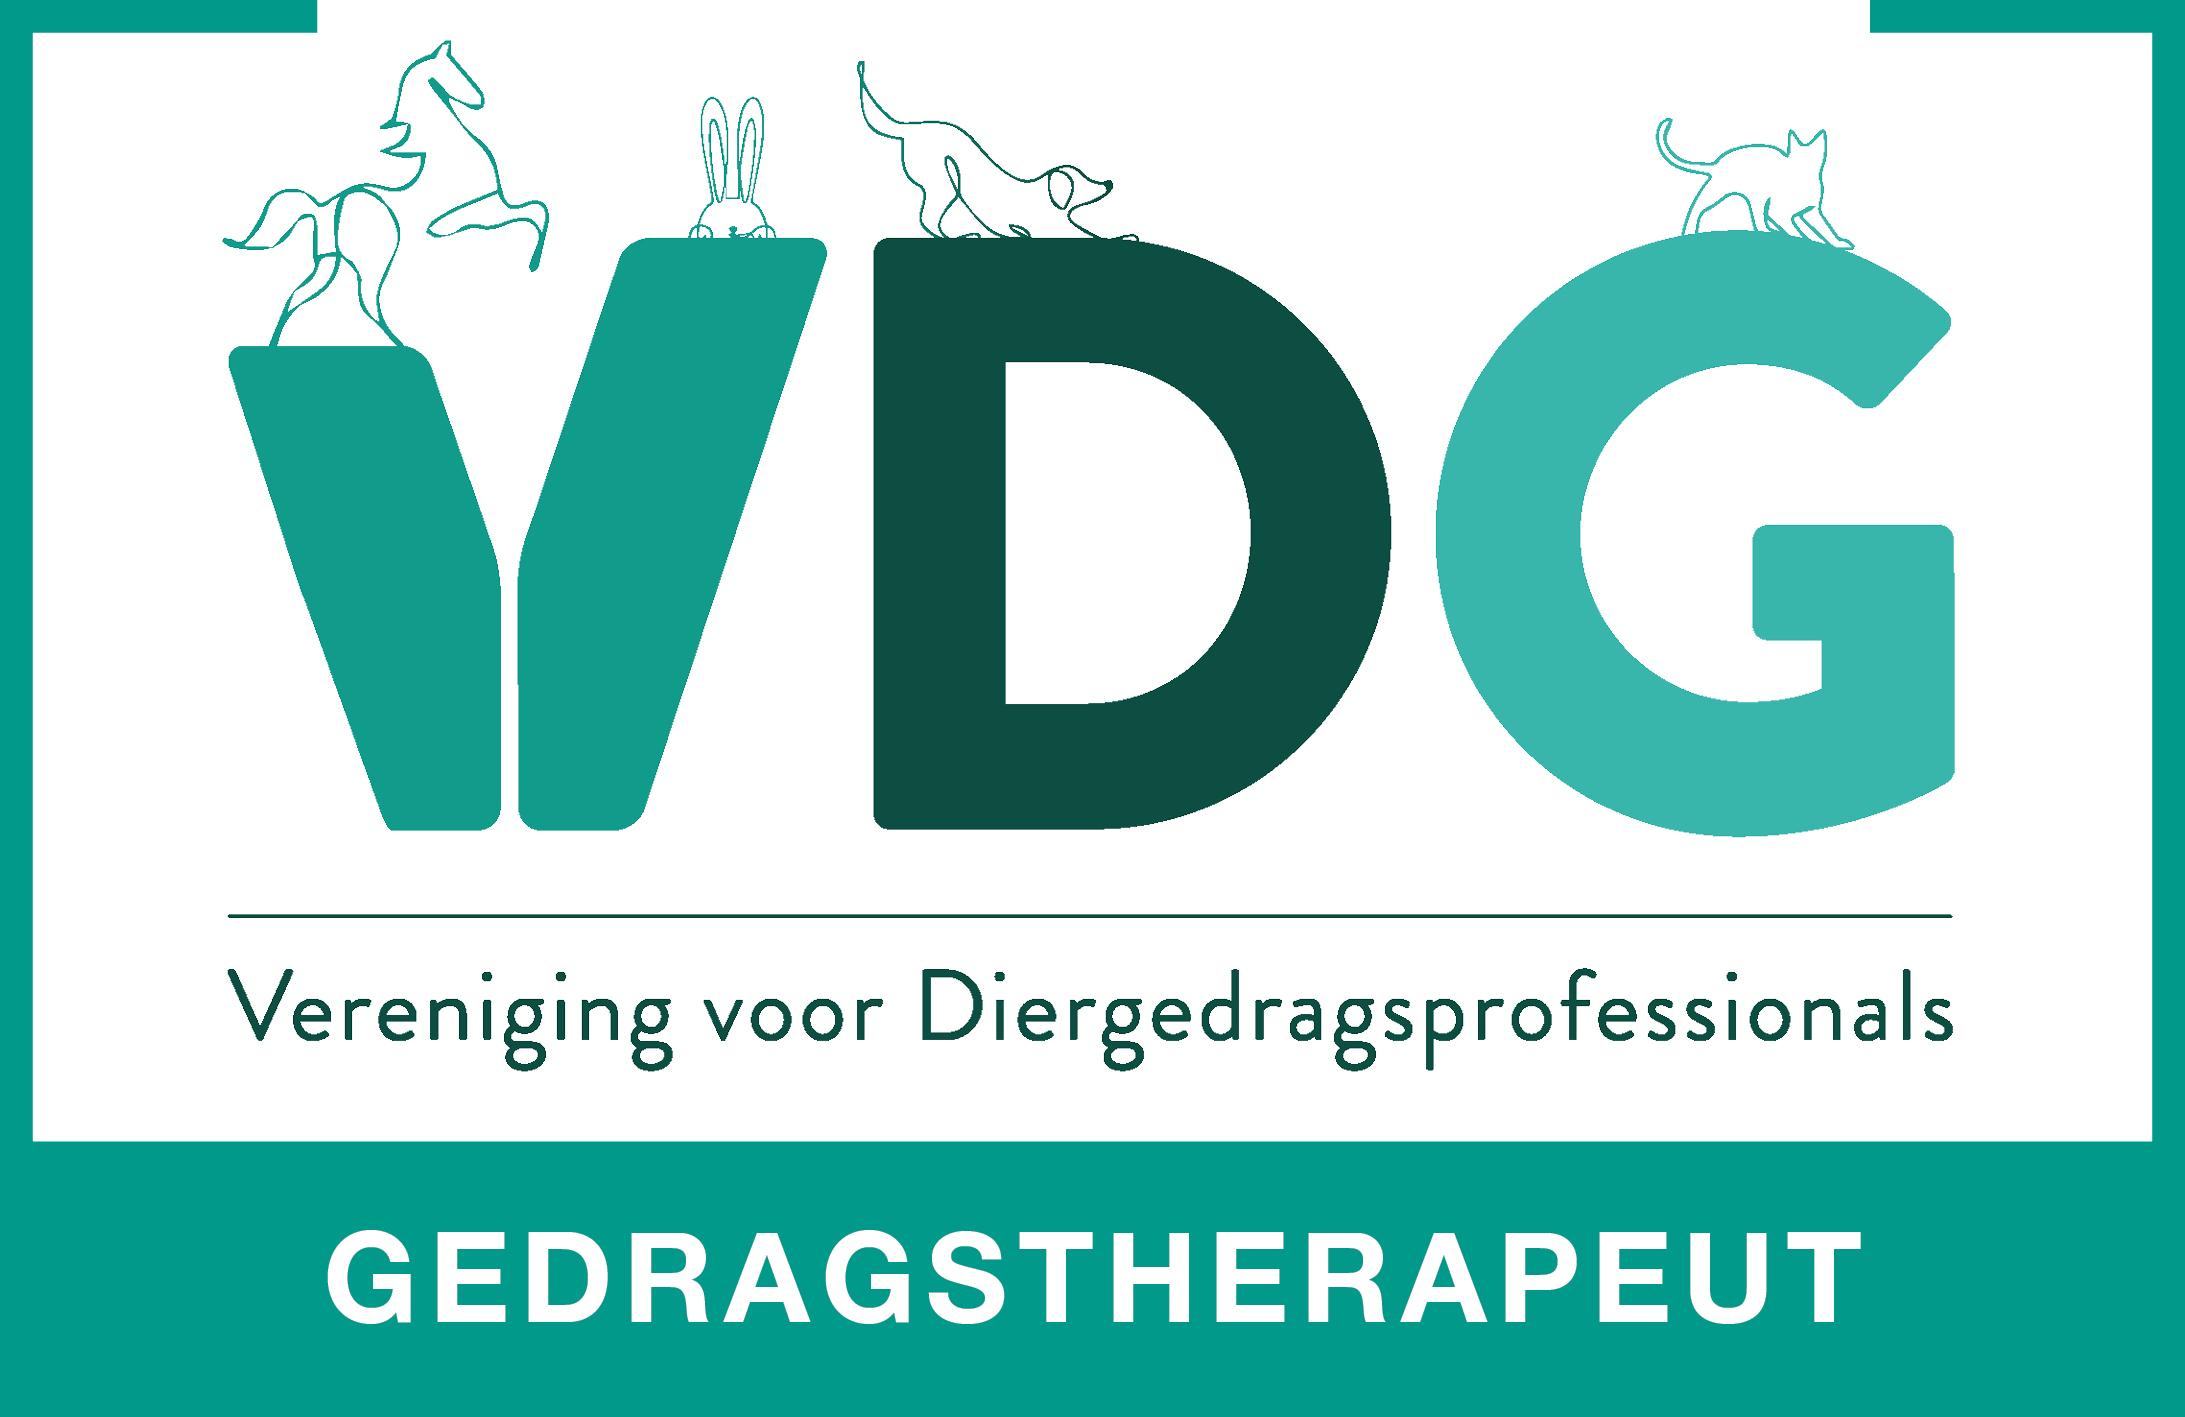 VDG-Logo-Gedragstherapeut